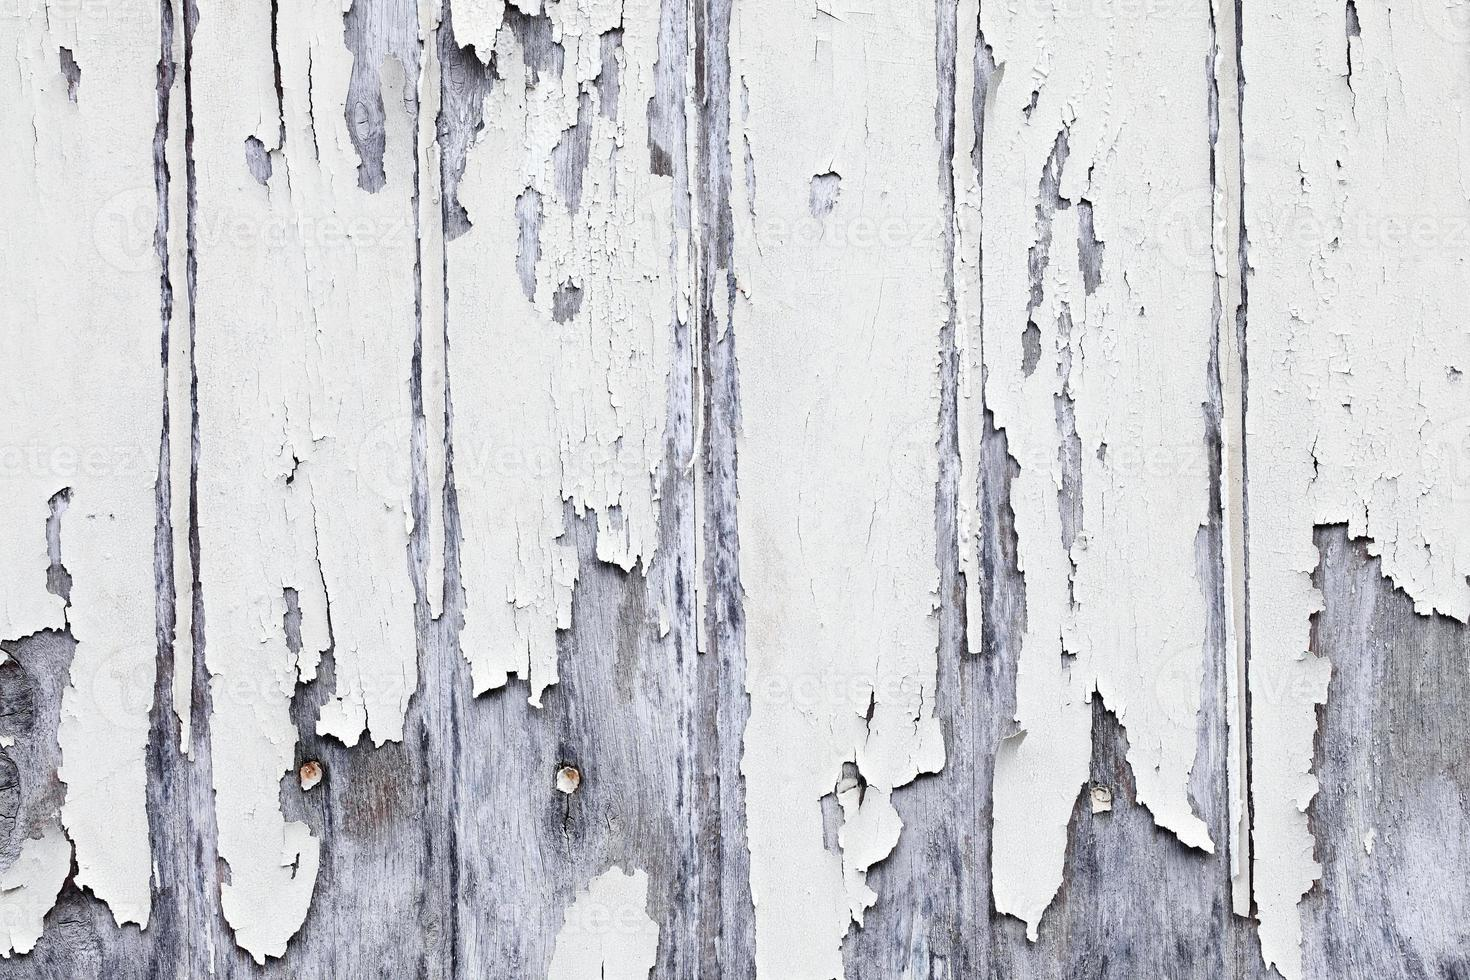 Grunge Holzplatte foto